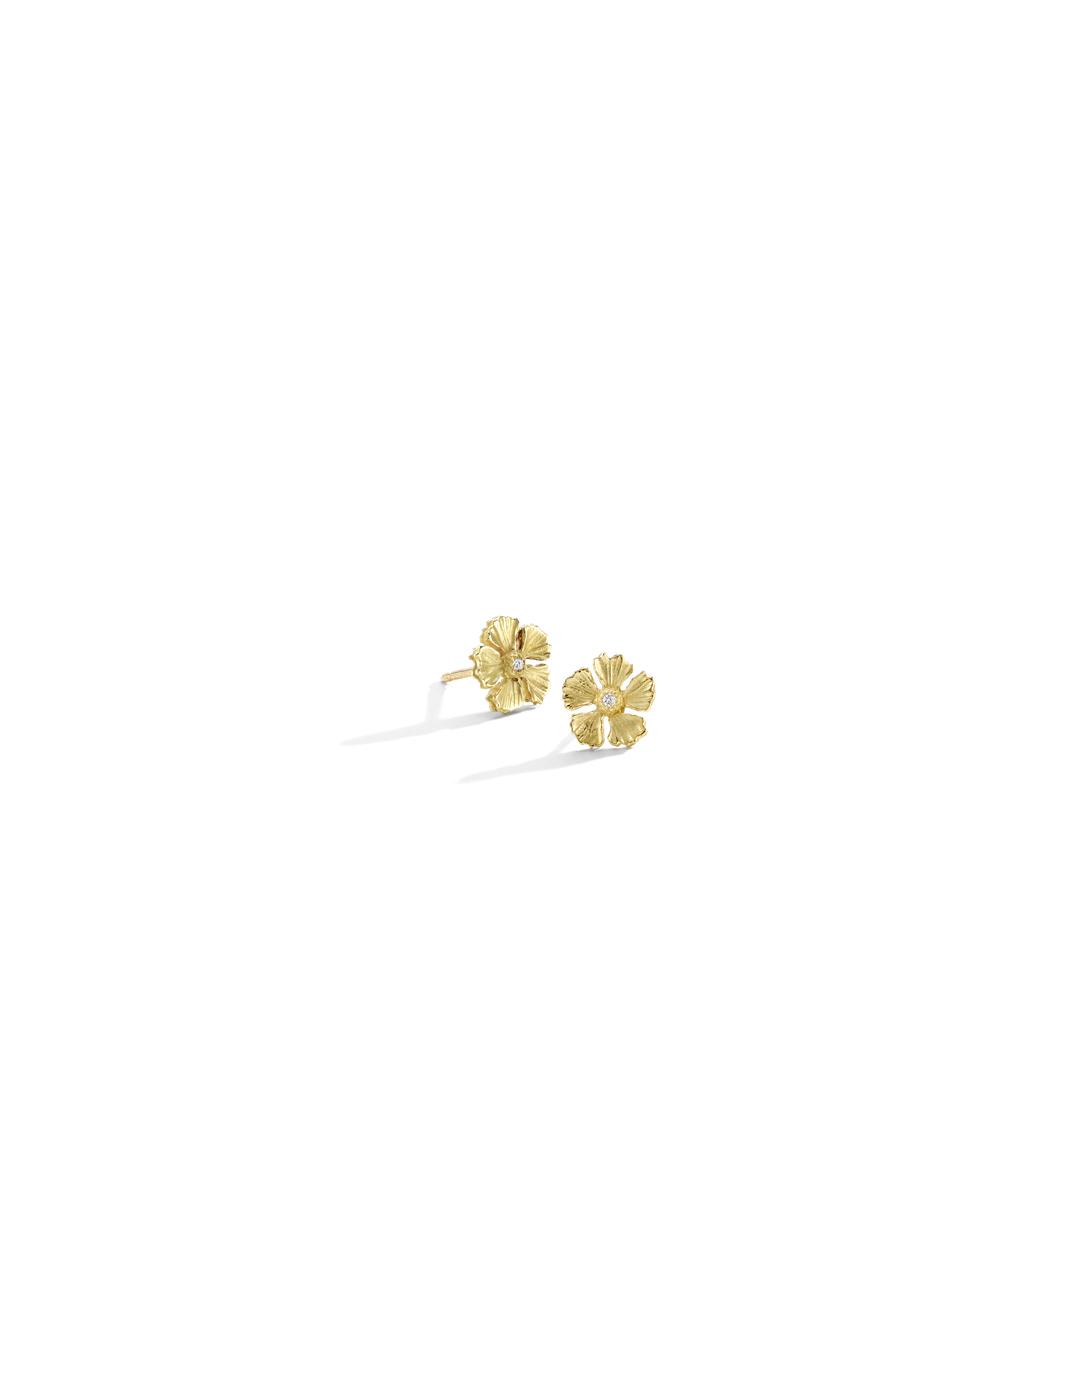 mish_products_earrings_StrwFlr-Sm-Stud-ER-1